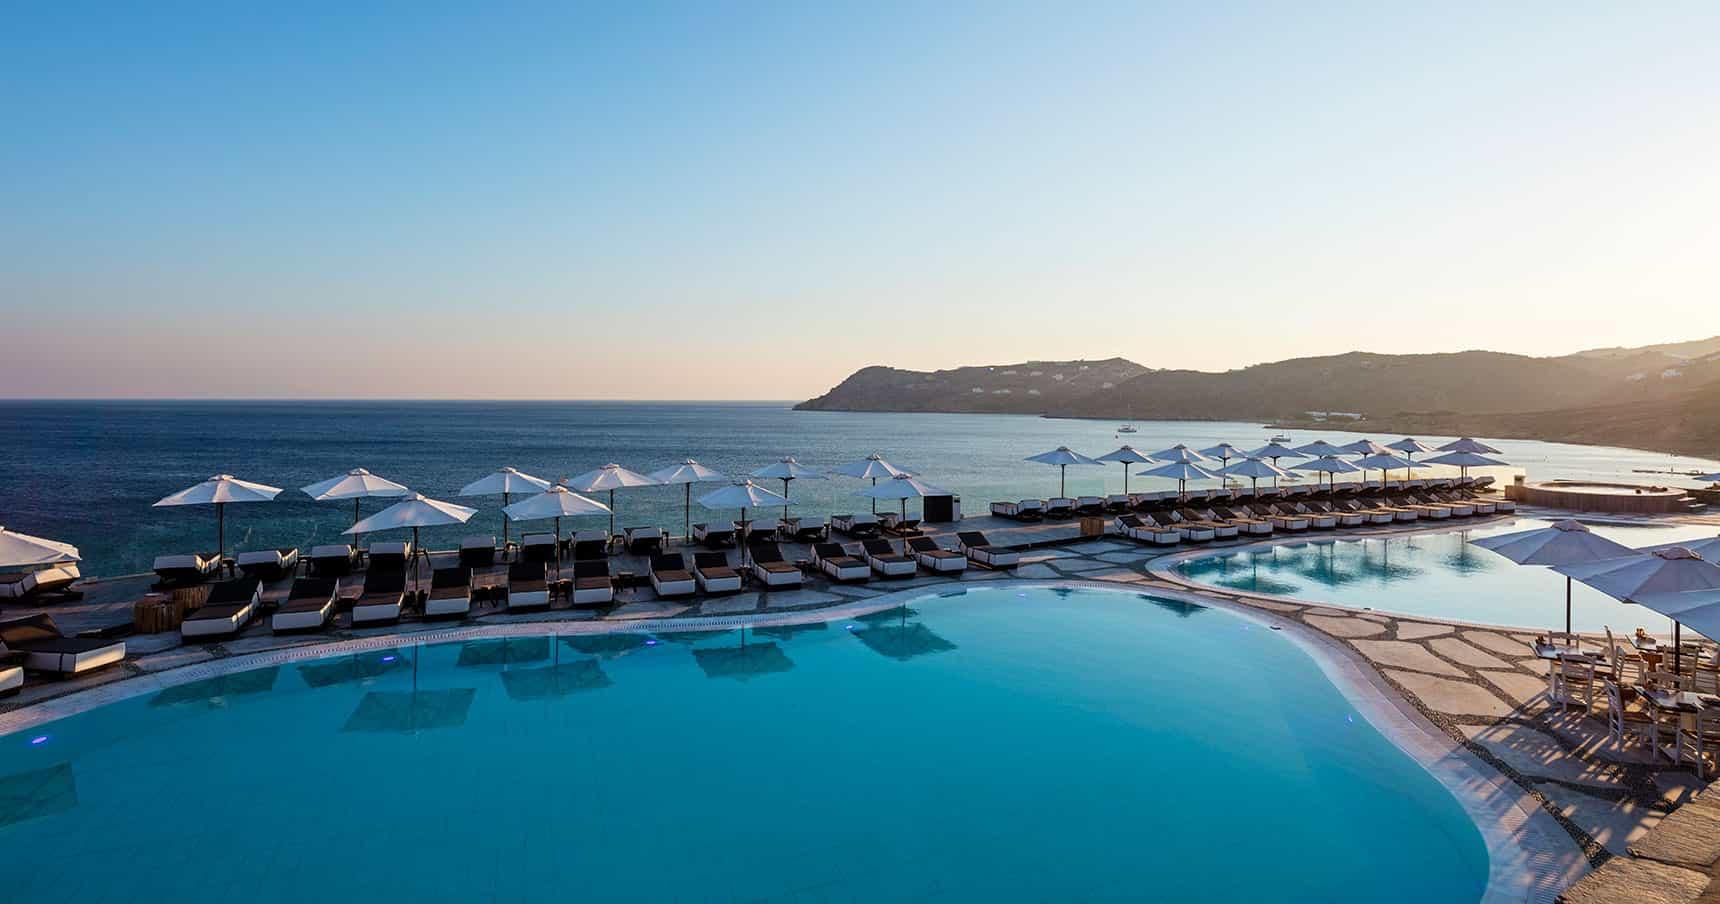 Gay Mykonos · Luxury Hotels